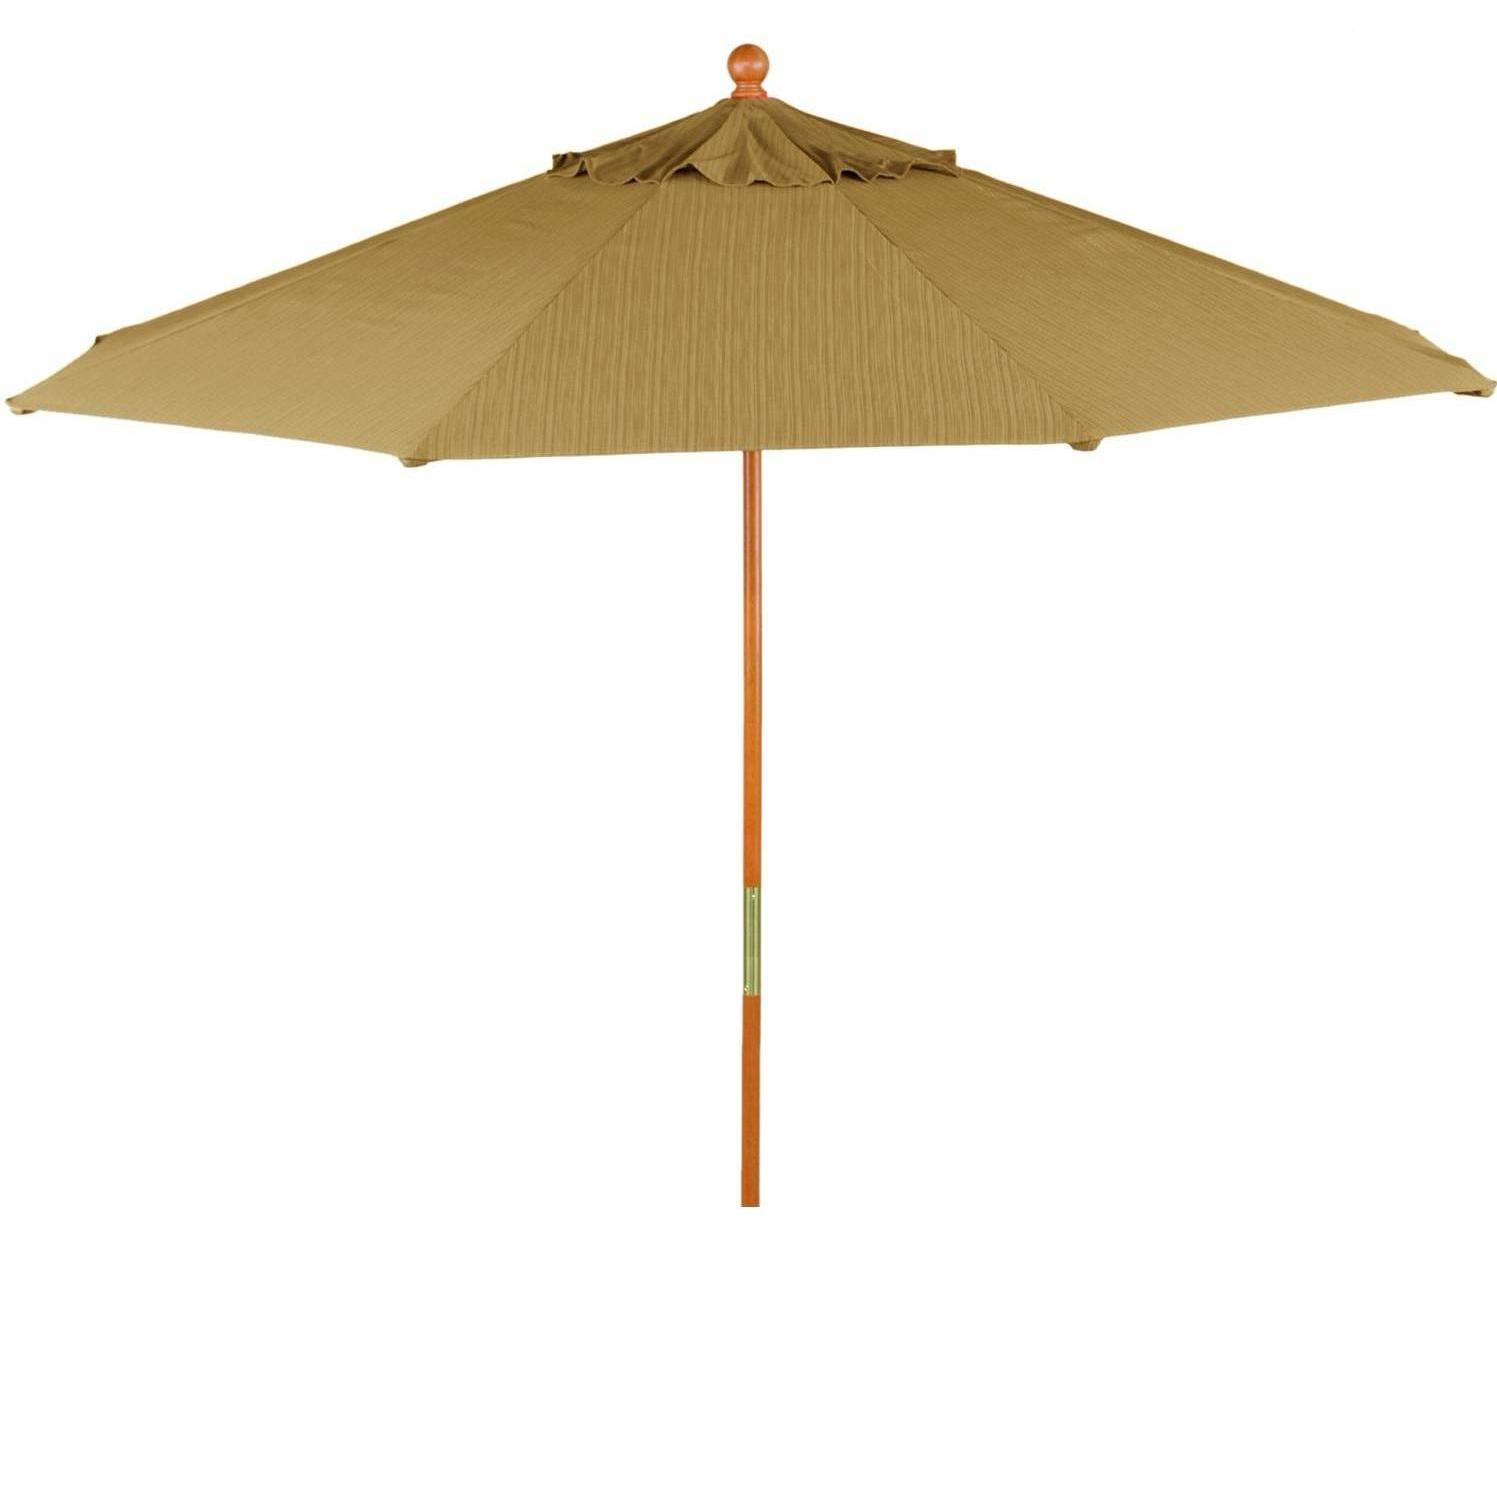 Oxford Garden 6 Ft. Octagon Wood Patio Umbrella With Push Lift - Dupione Walnut